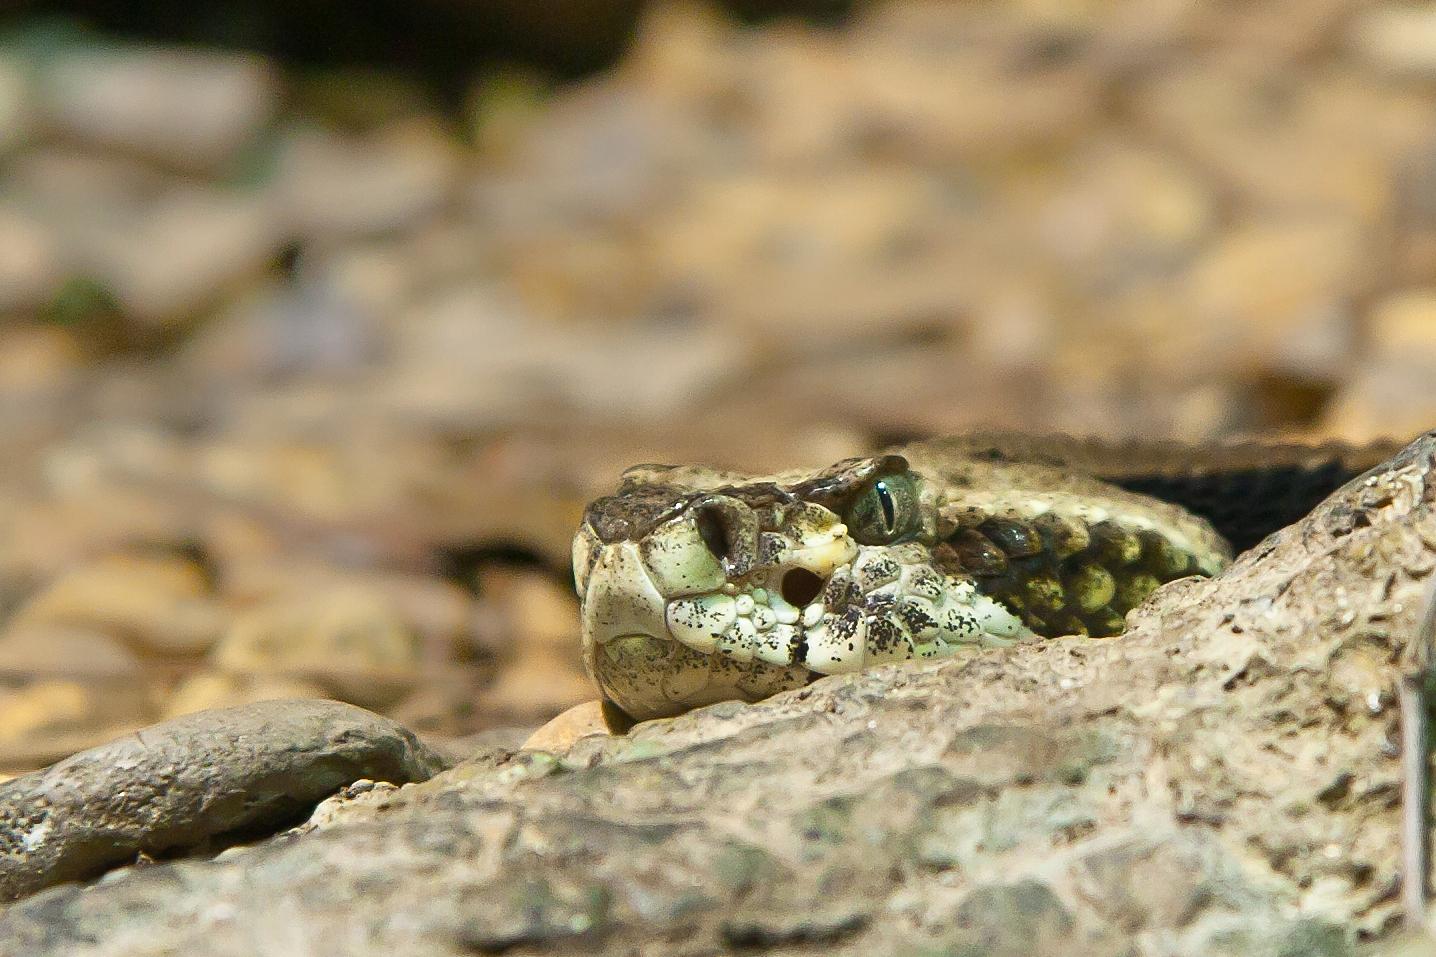 Pit viper snake wallpaper - photo#15